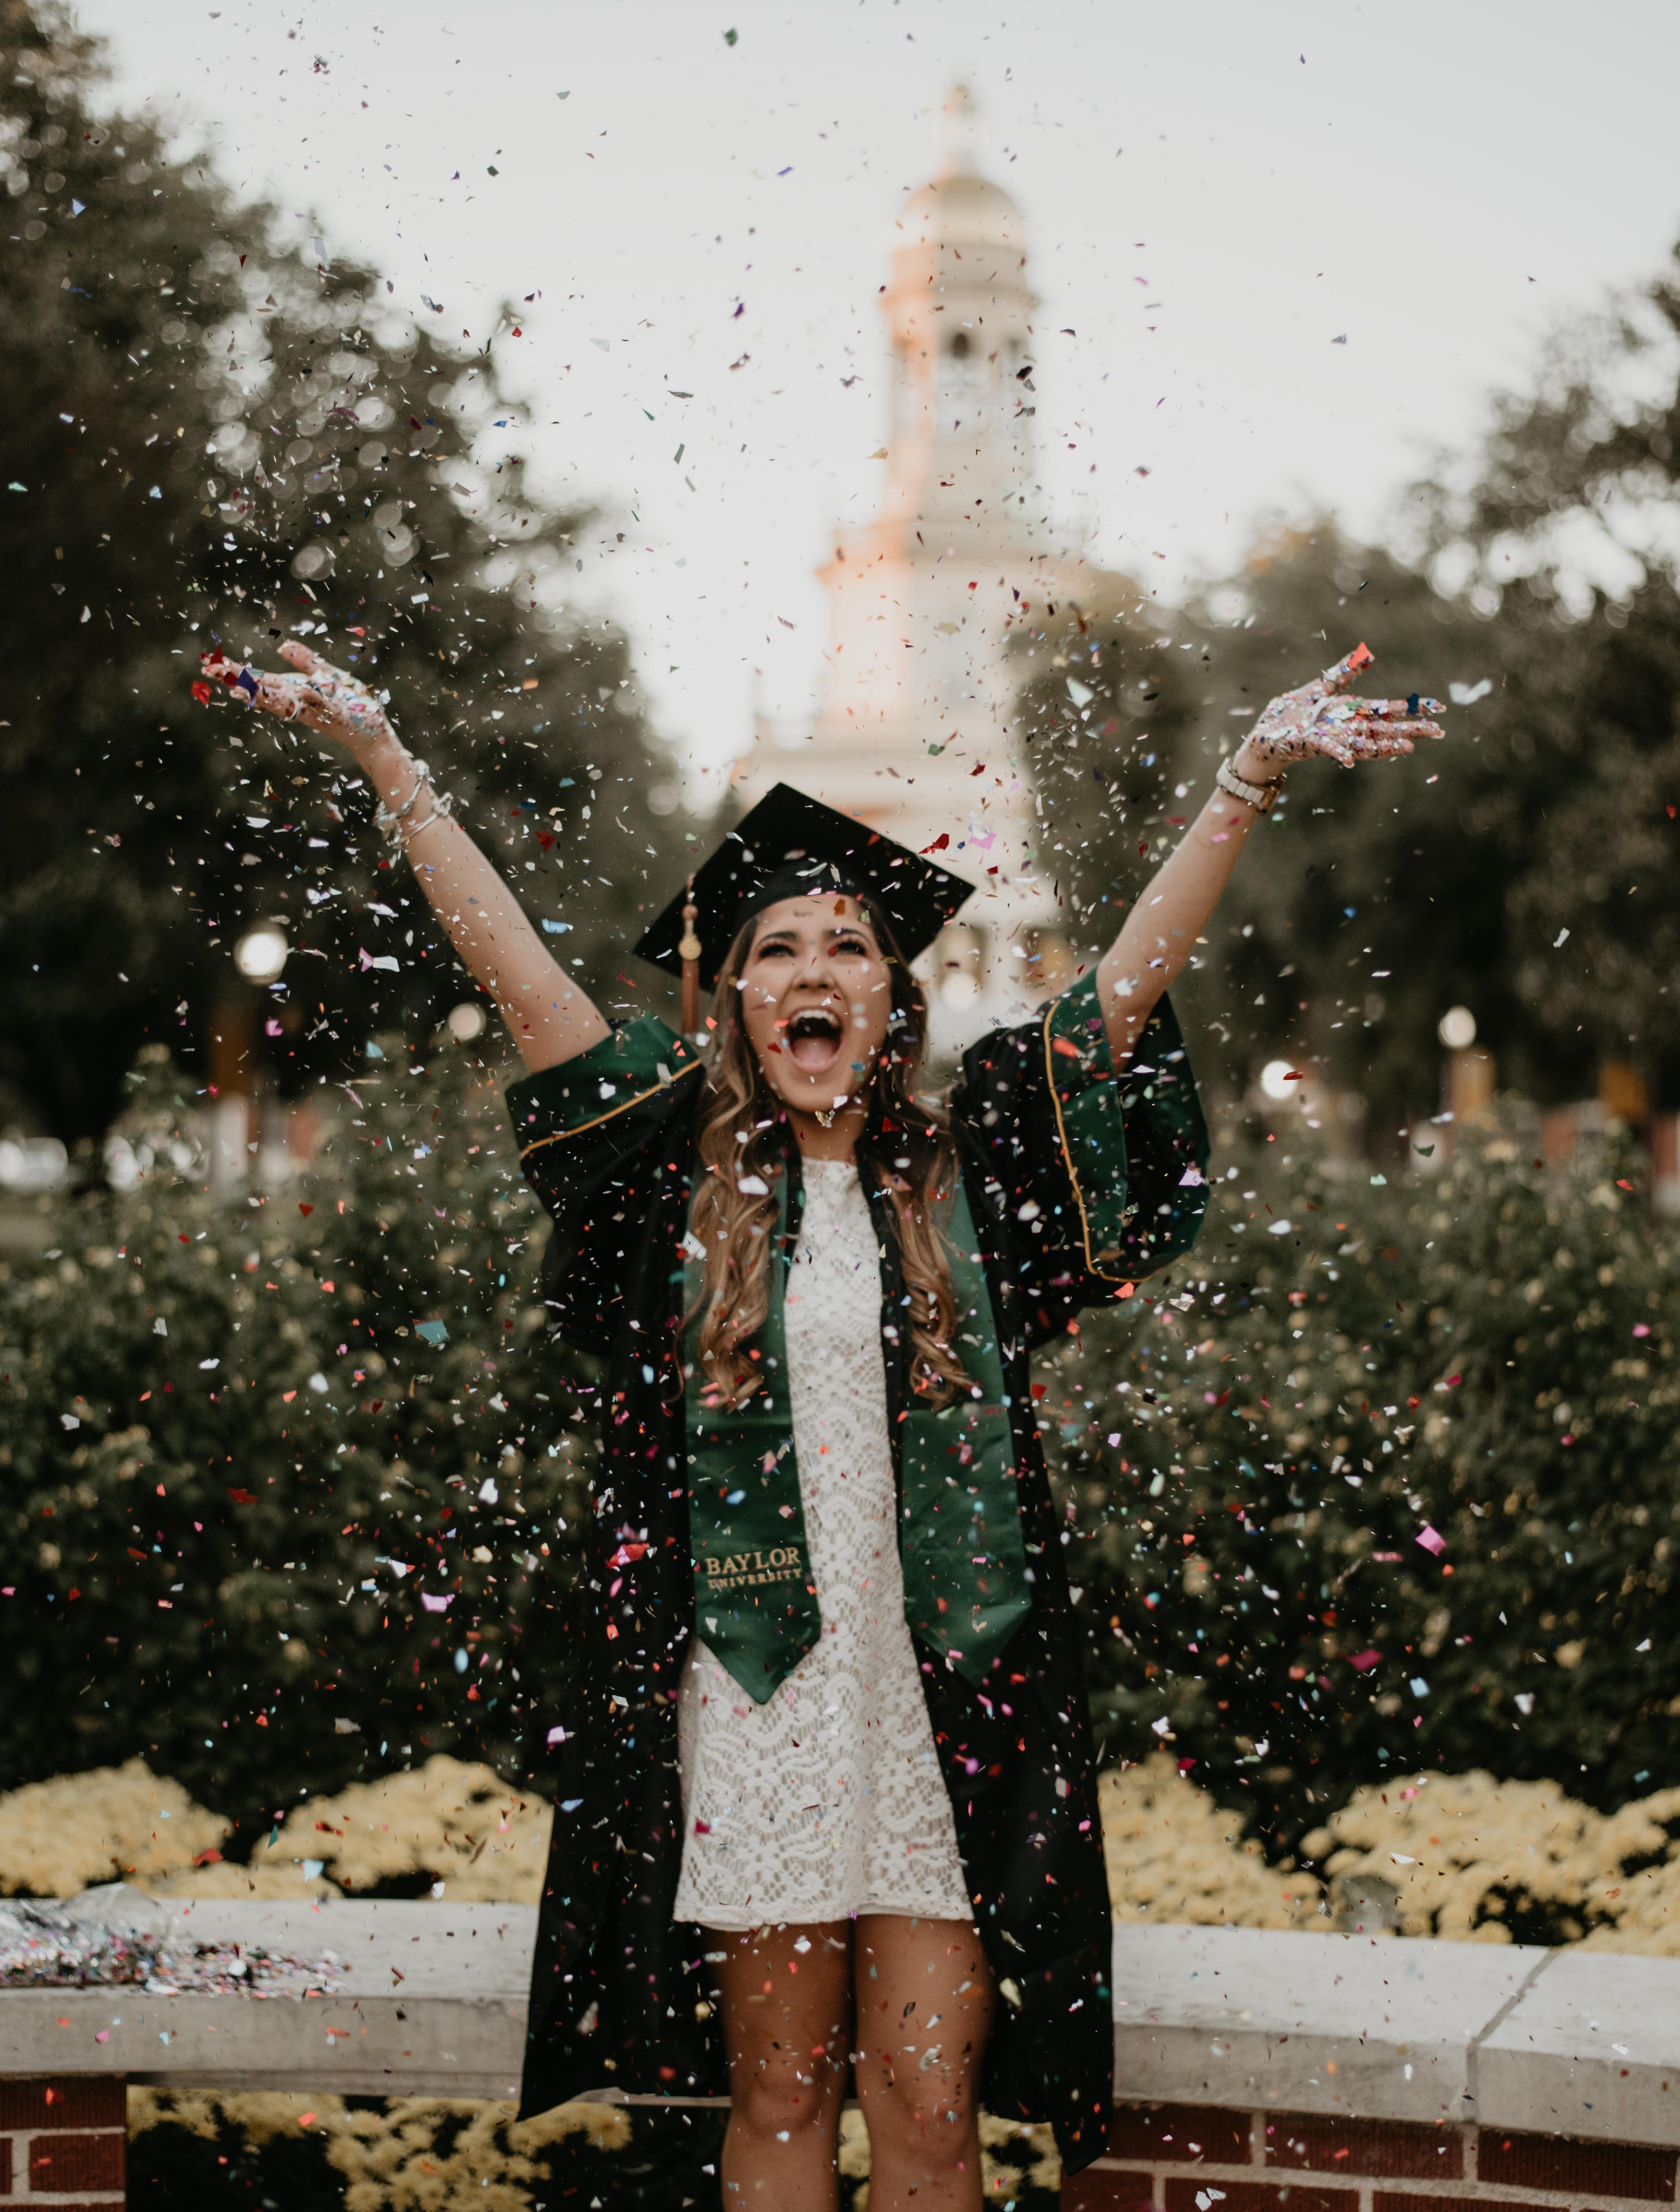 Baylor University 2018 Graduate